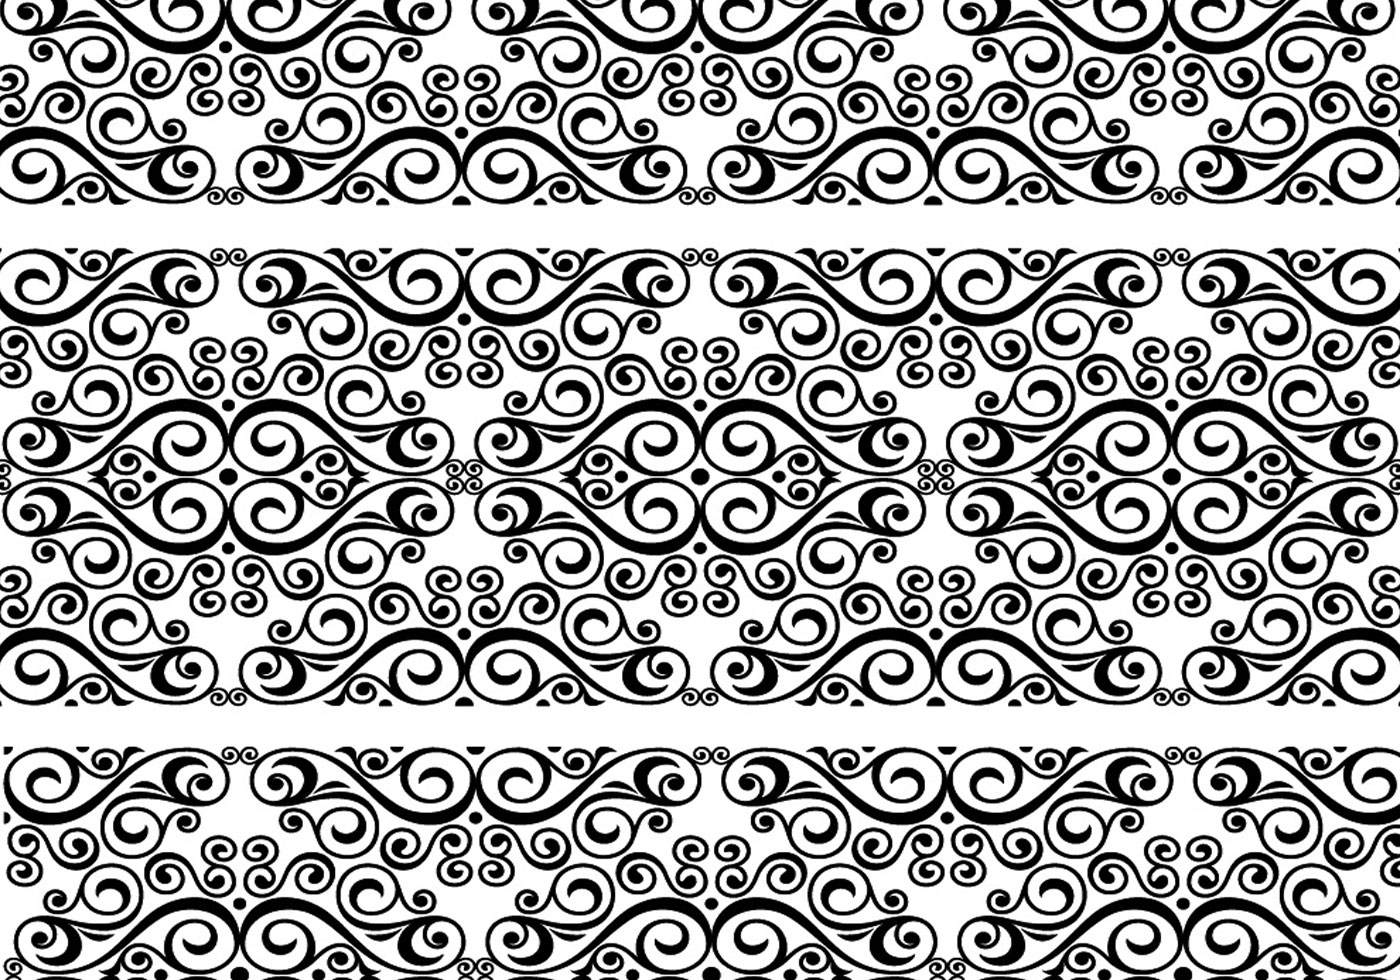 Decorative Patterns Interesting Design